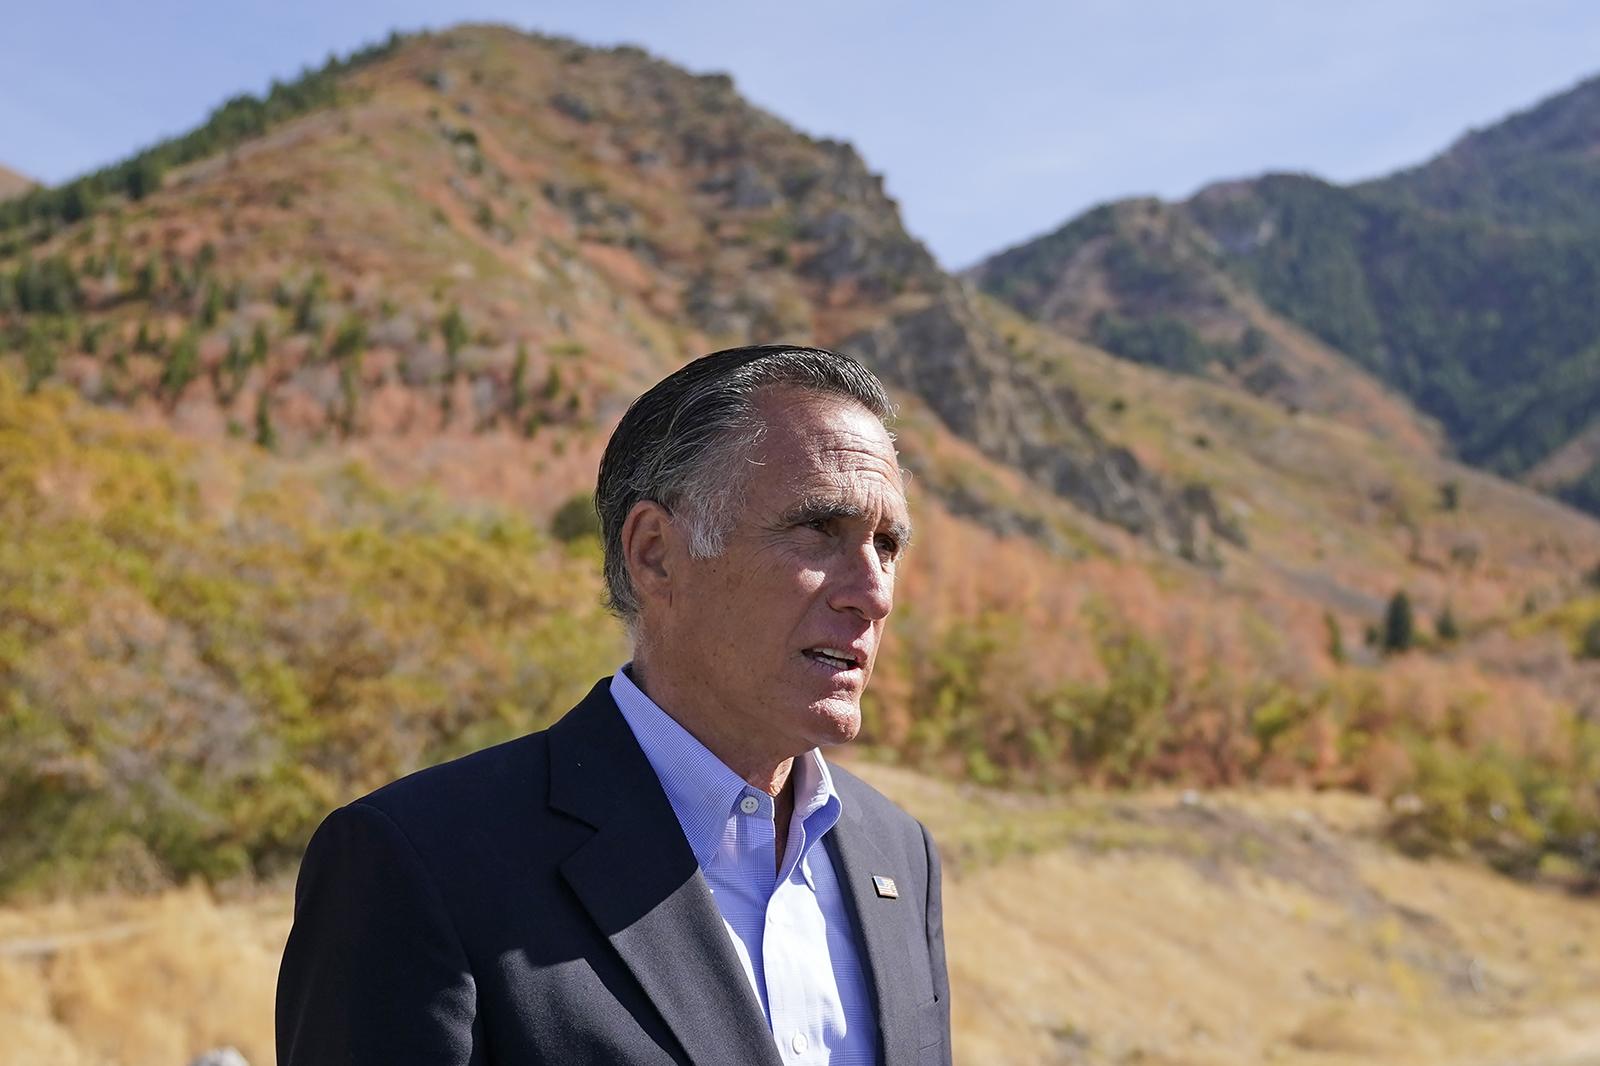 Sen. Mitt Romney, R-Utah,speaks to reporters following a news conference Thursday, October 15, near Neffs Canyon in Salt Lake City.